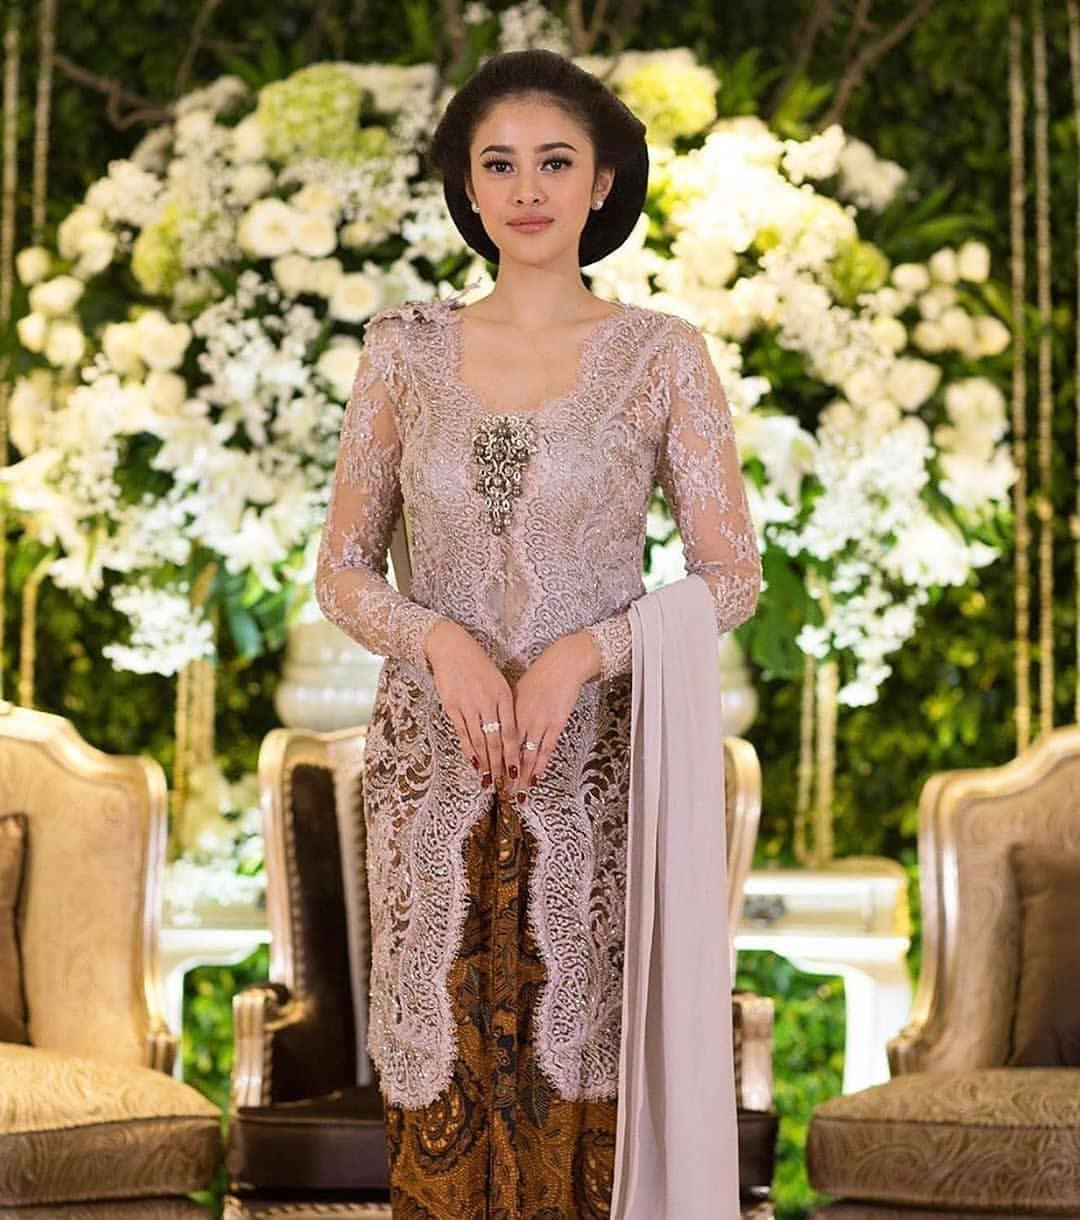 Baju batik modern Kejawen